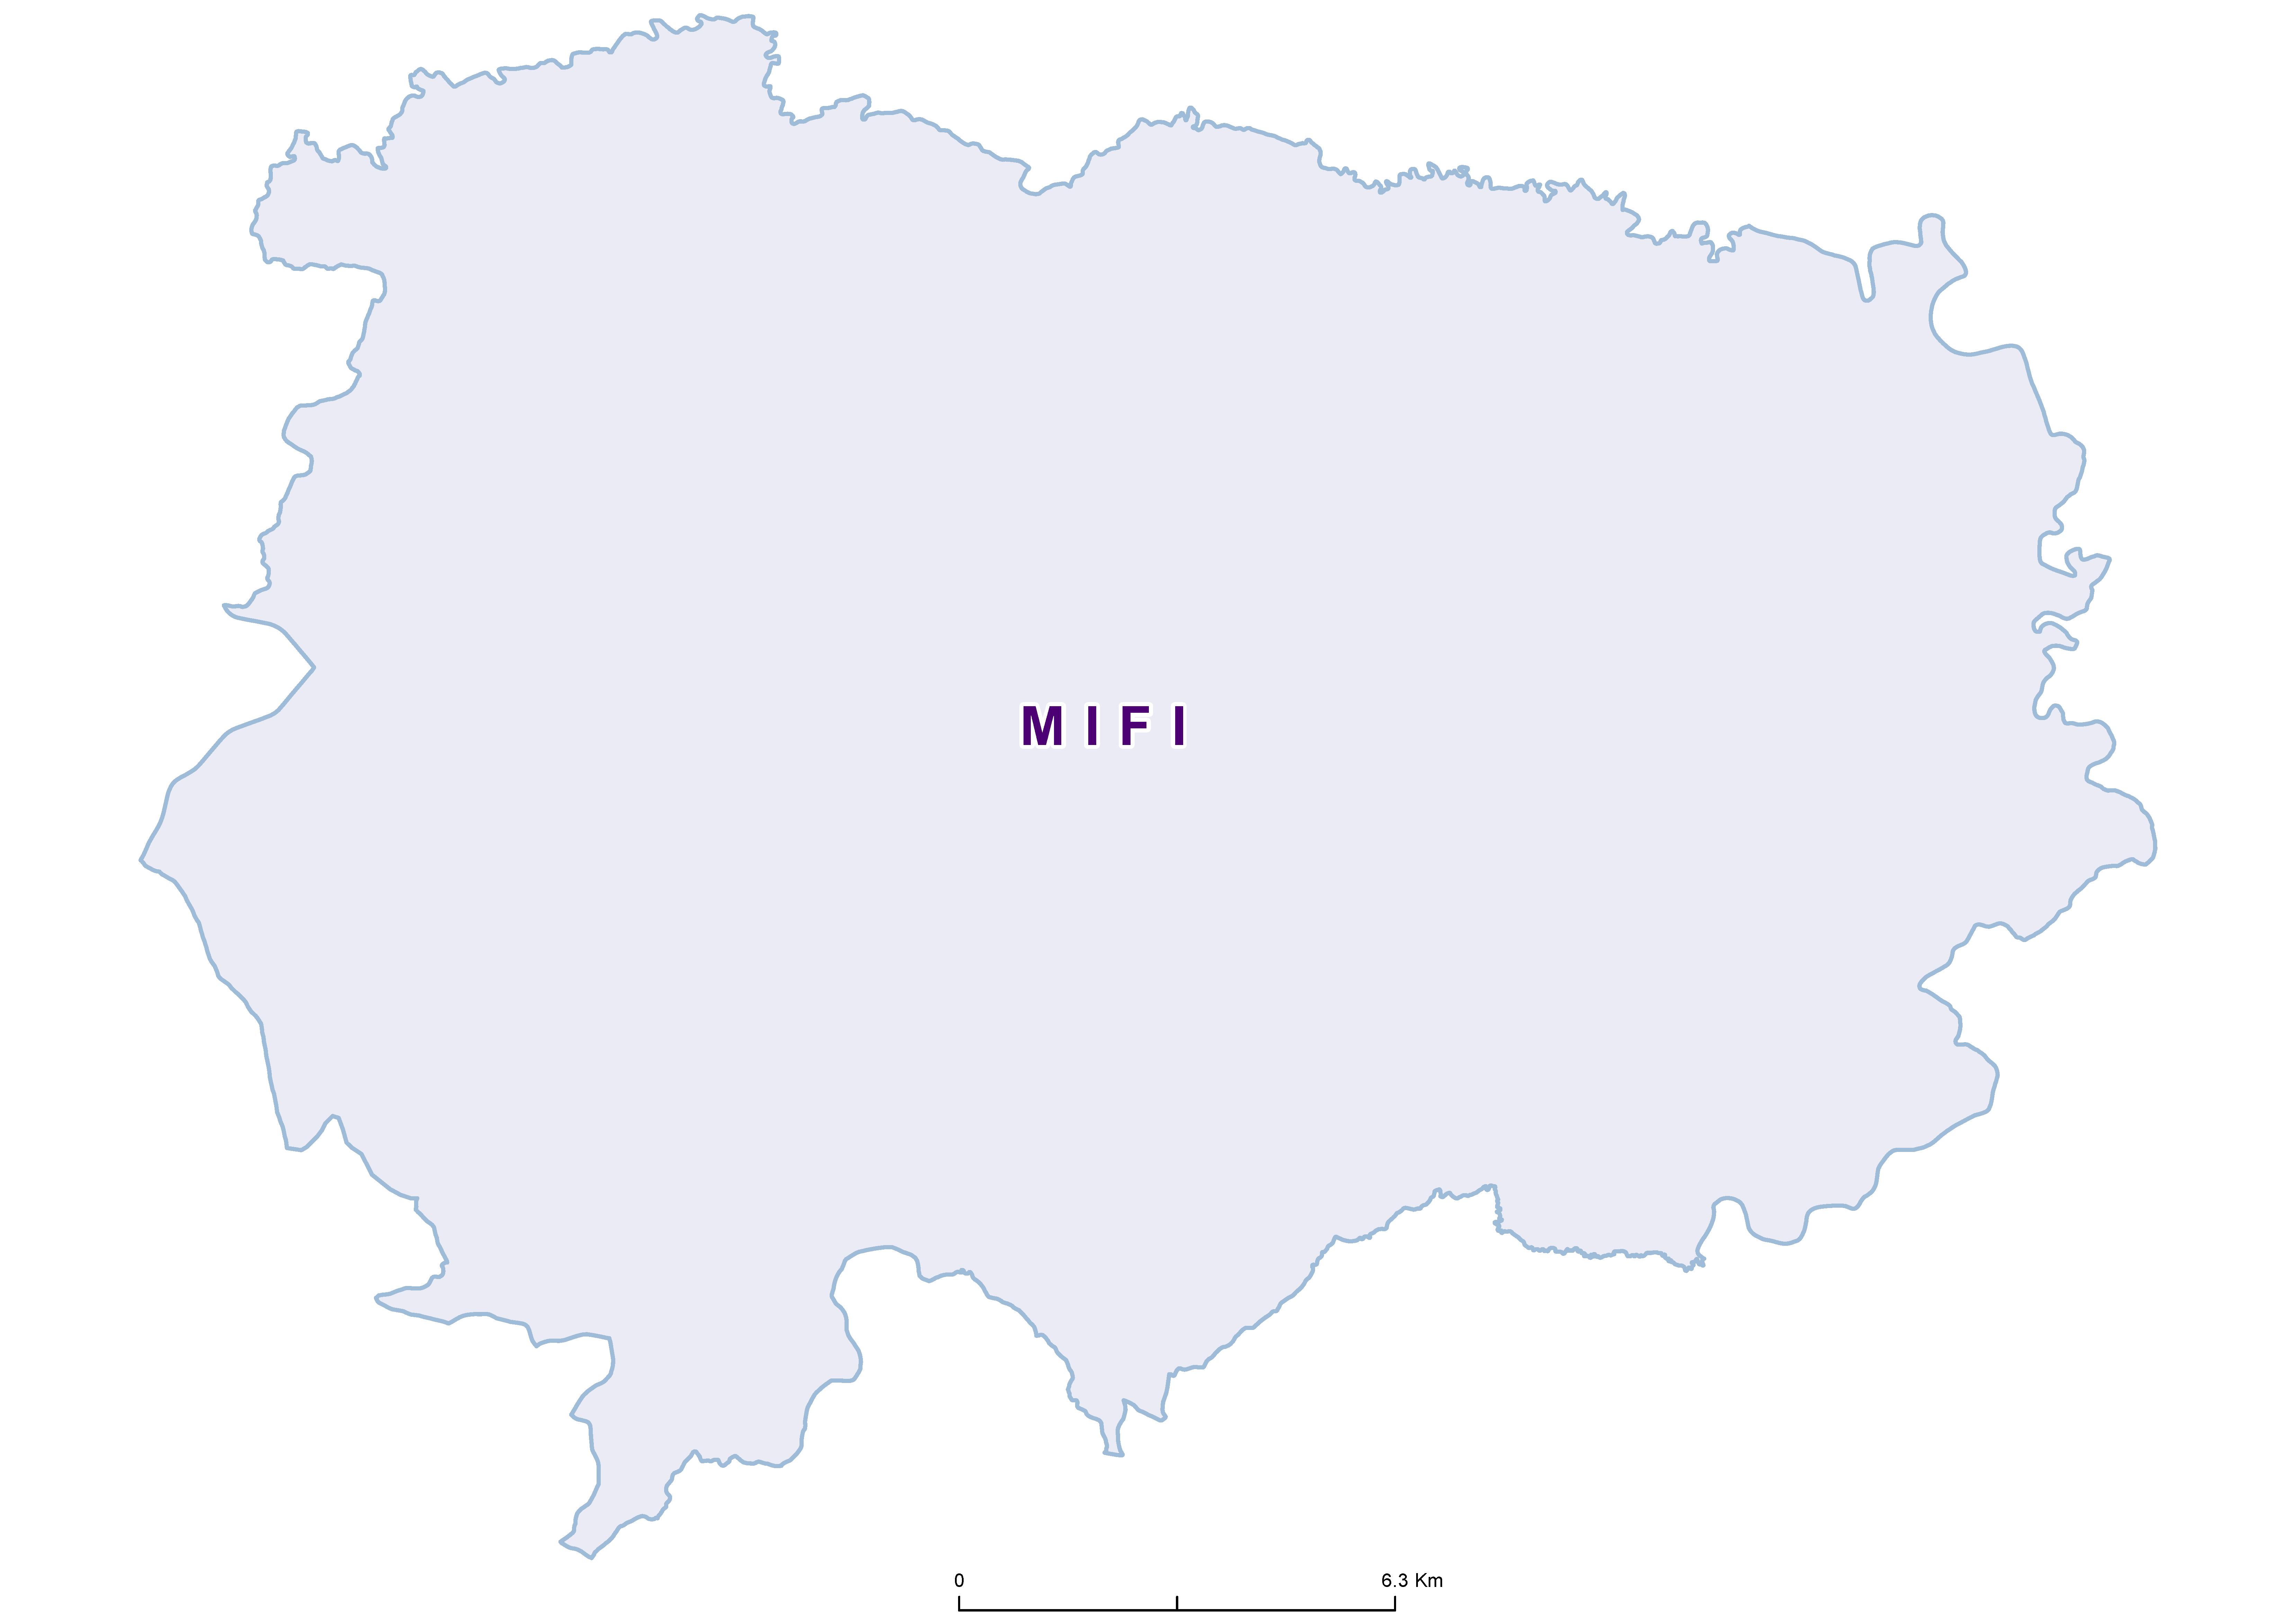 Mifi Mean SCH 20180001